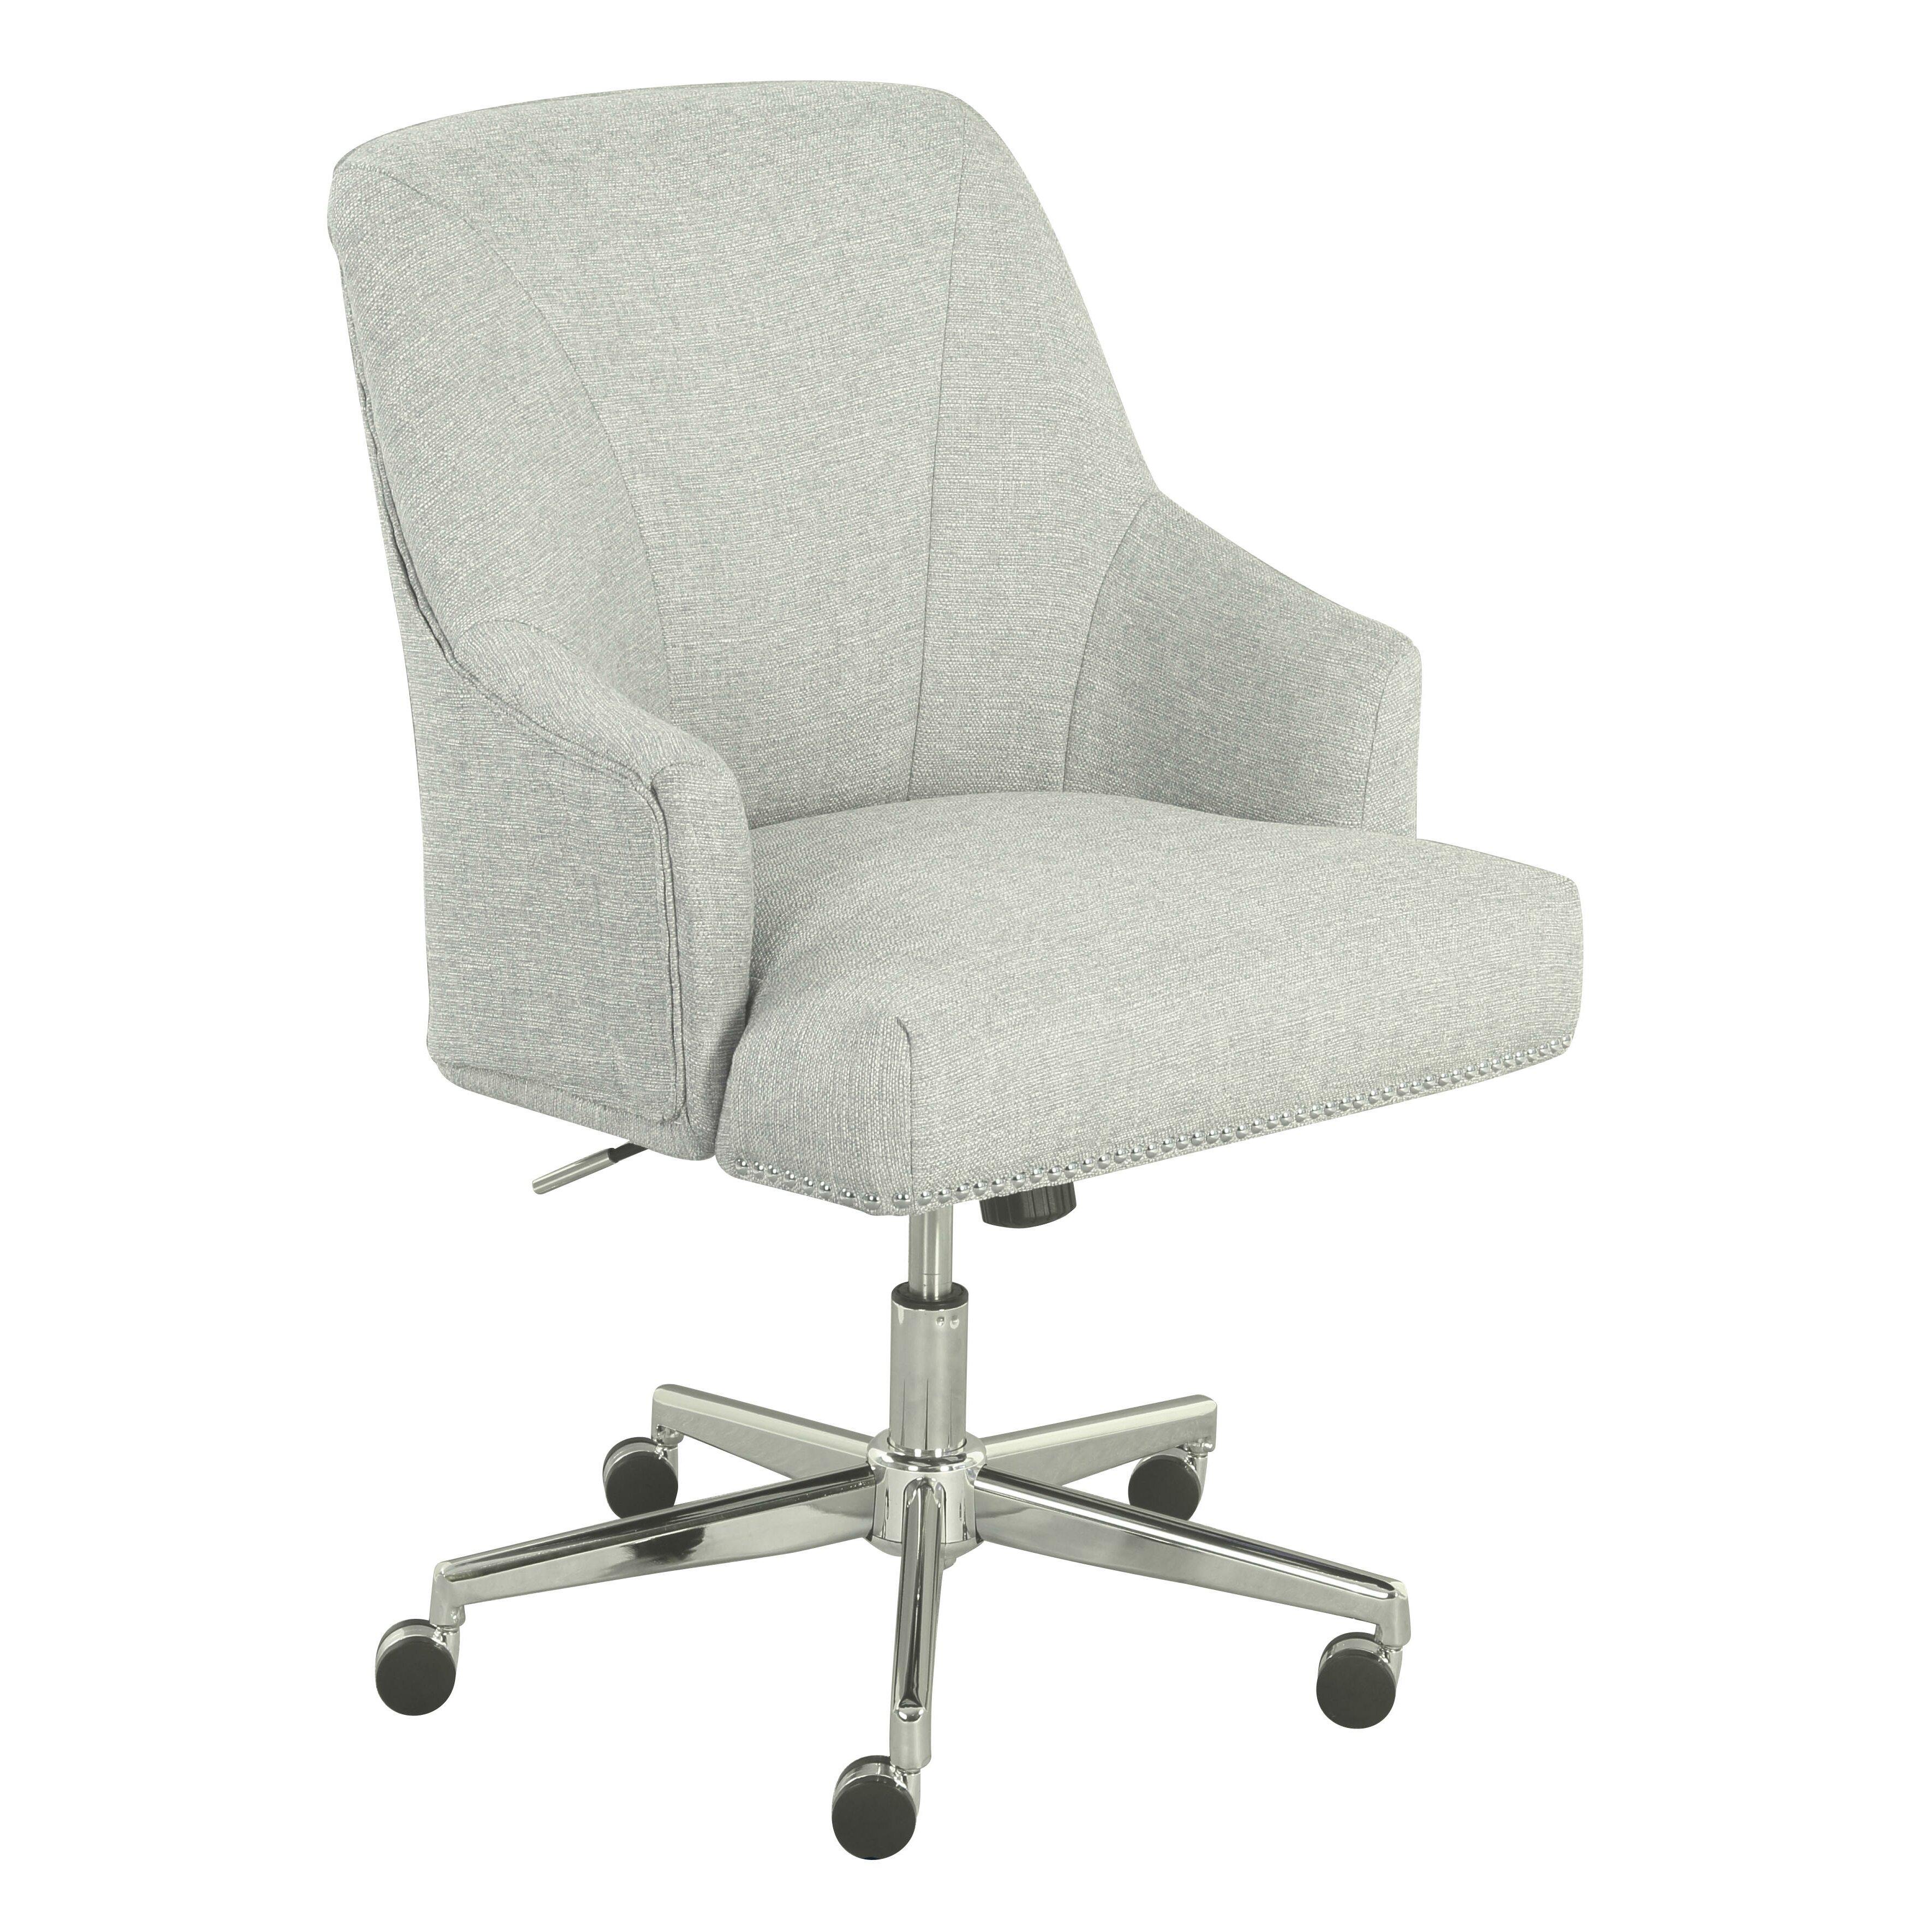 Serta At Home Serta Leighton Mid Back Desk Chair Amp Reviews